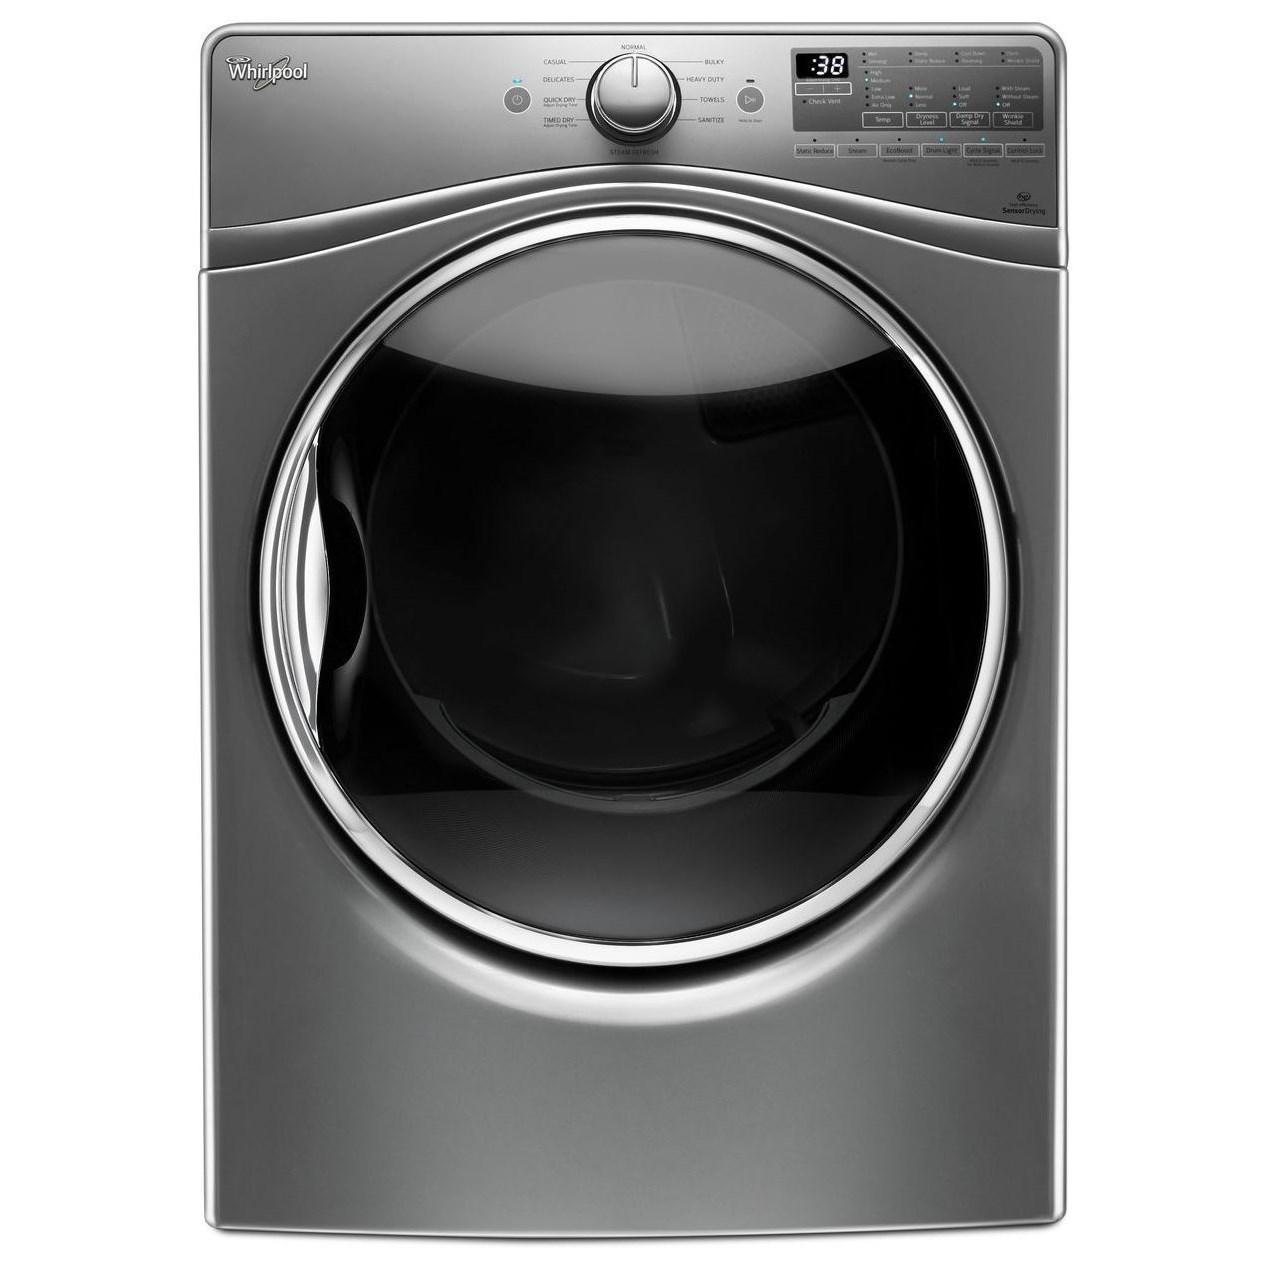 Whirlpool Gas Dryers 7.4 cu. ft. Gas Dryer - Item Number: WGD92HEFC